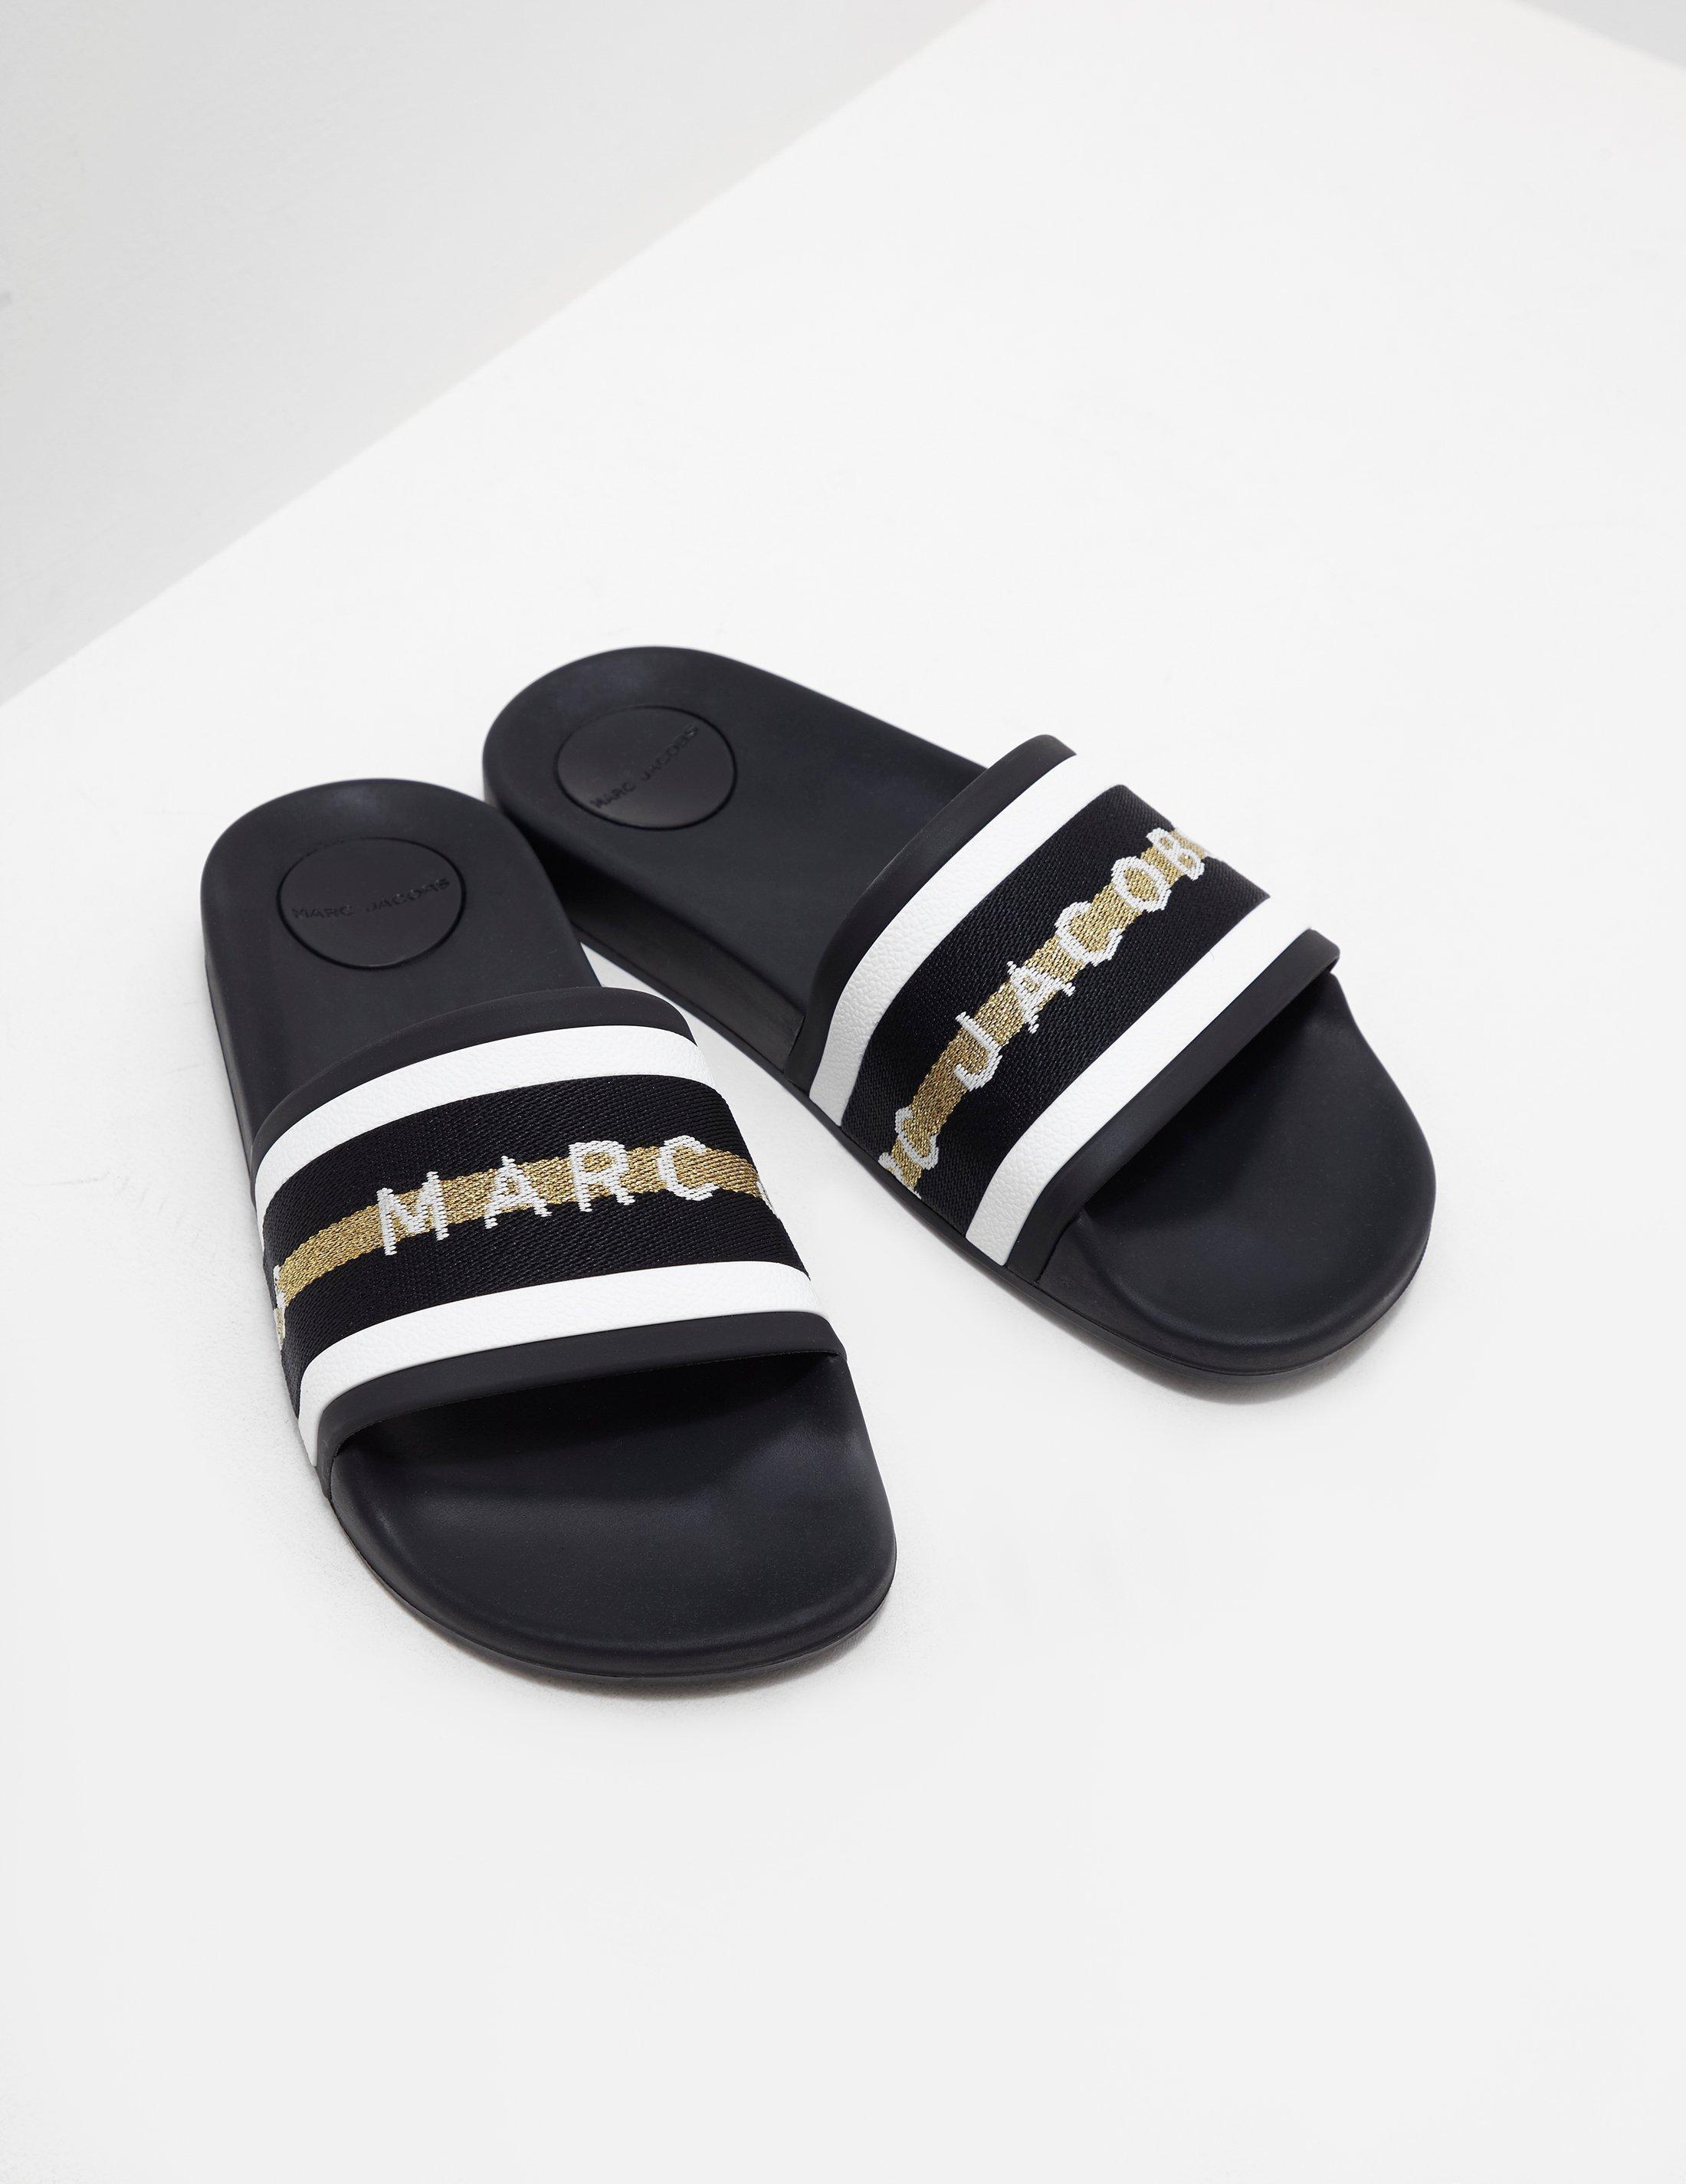 7b47fd6658aa Lyst - Marc Jacobs Womens Cooper Slides Black in Black